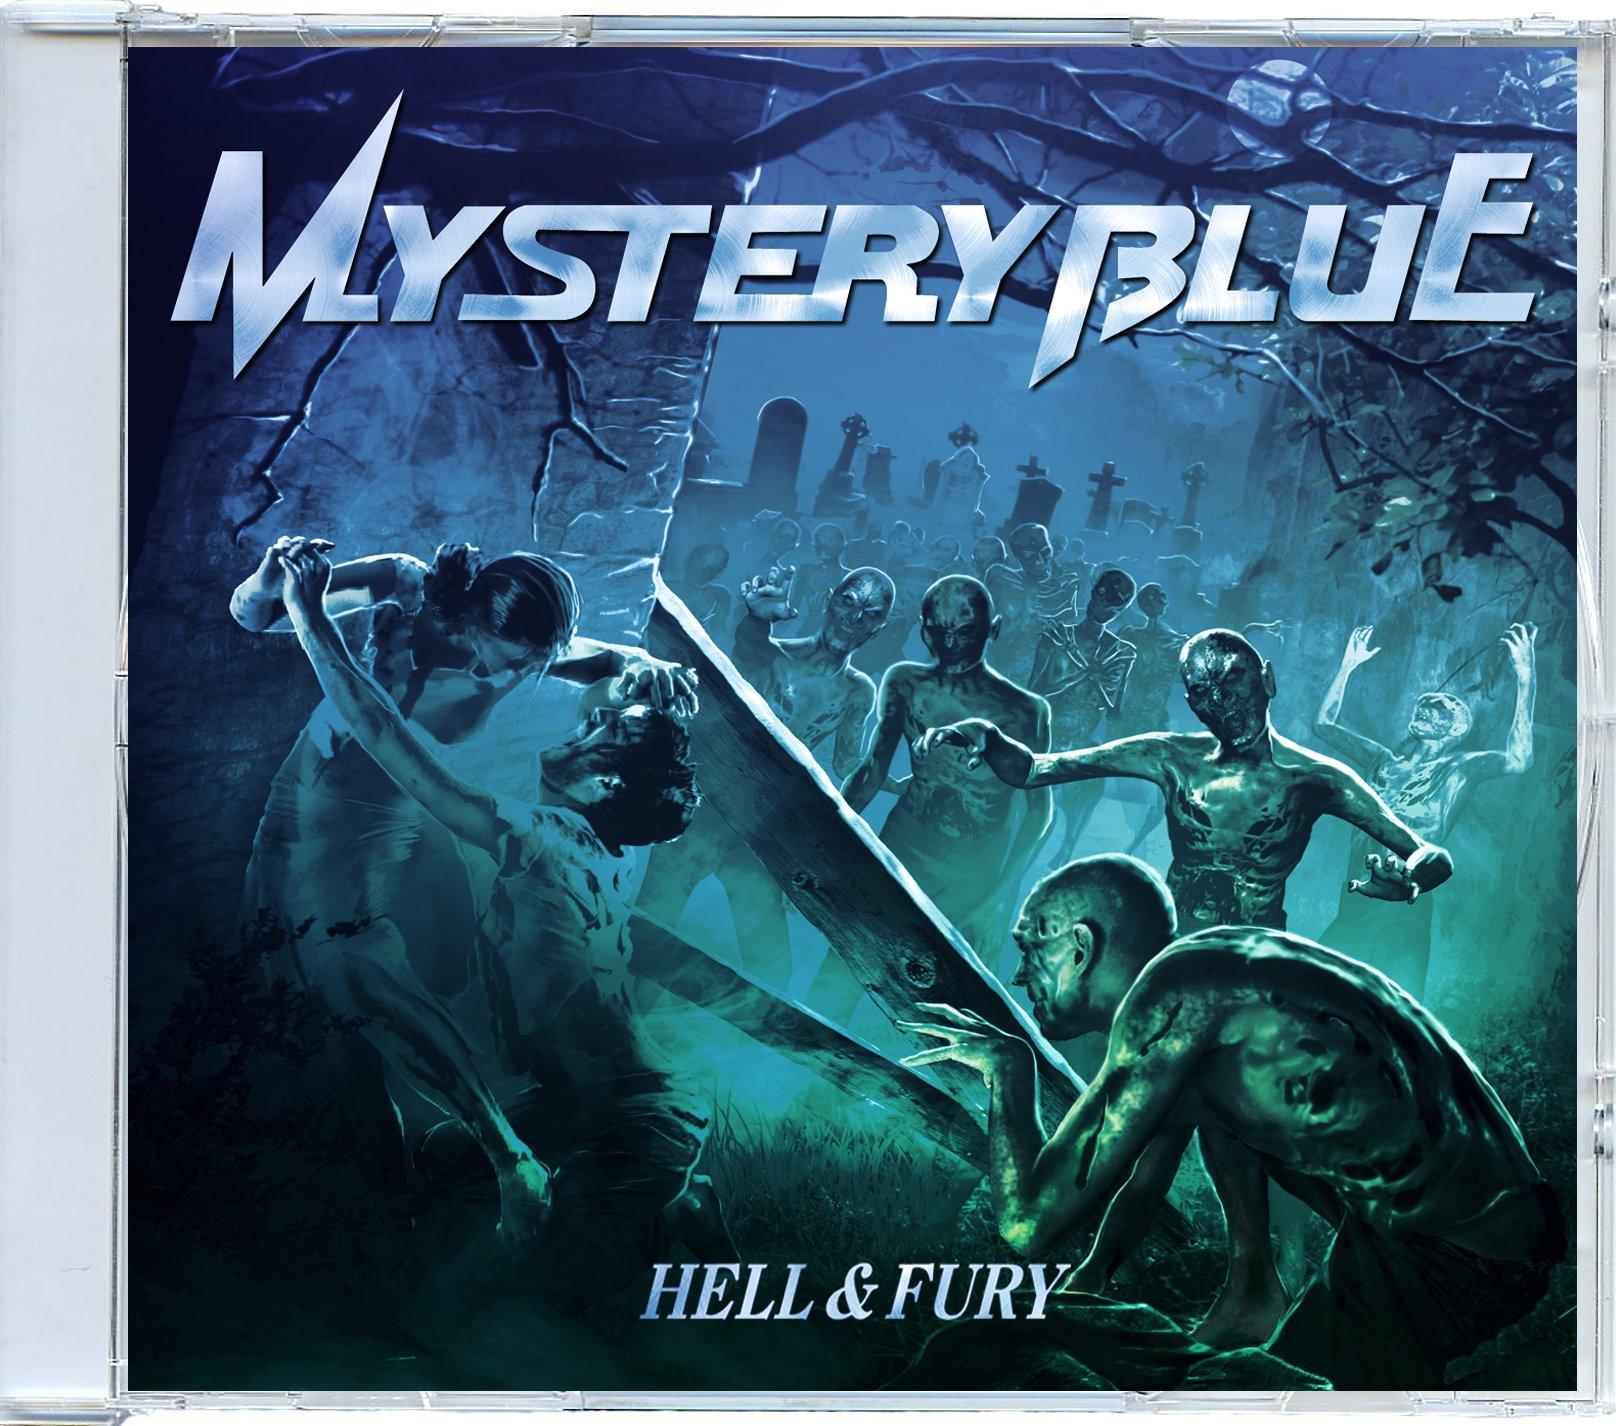 Hell & Fury